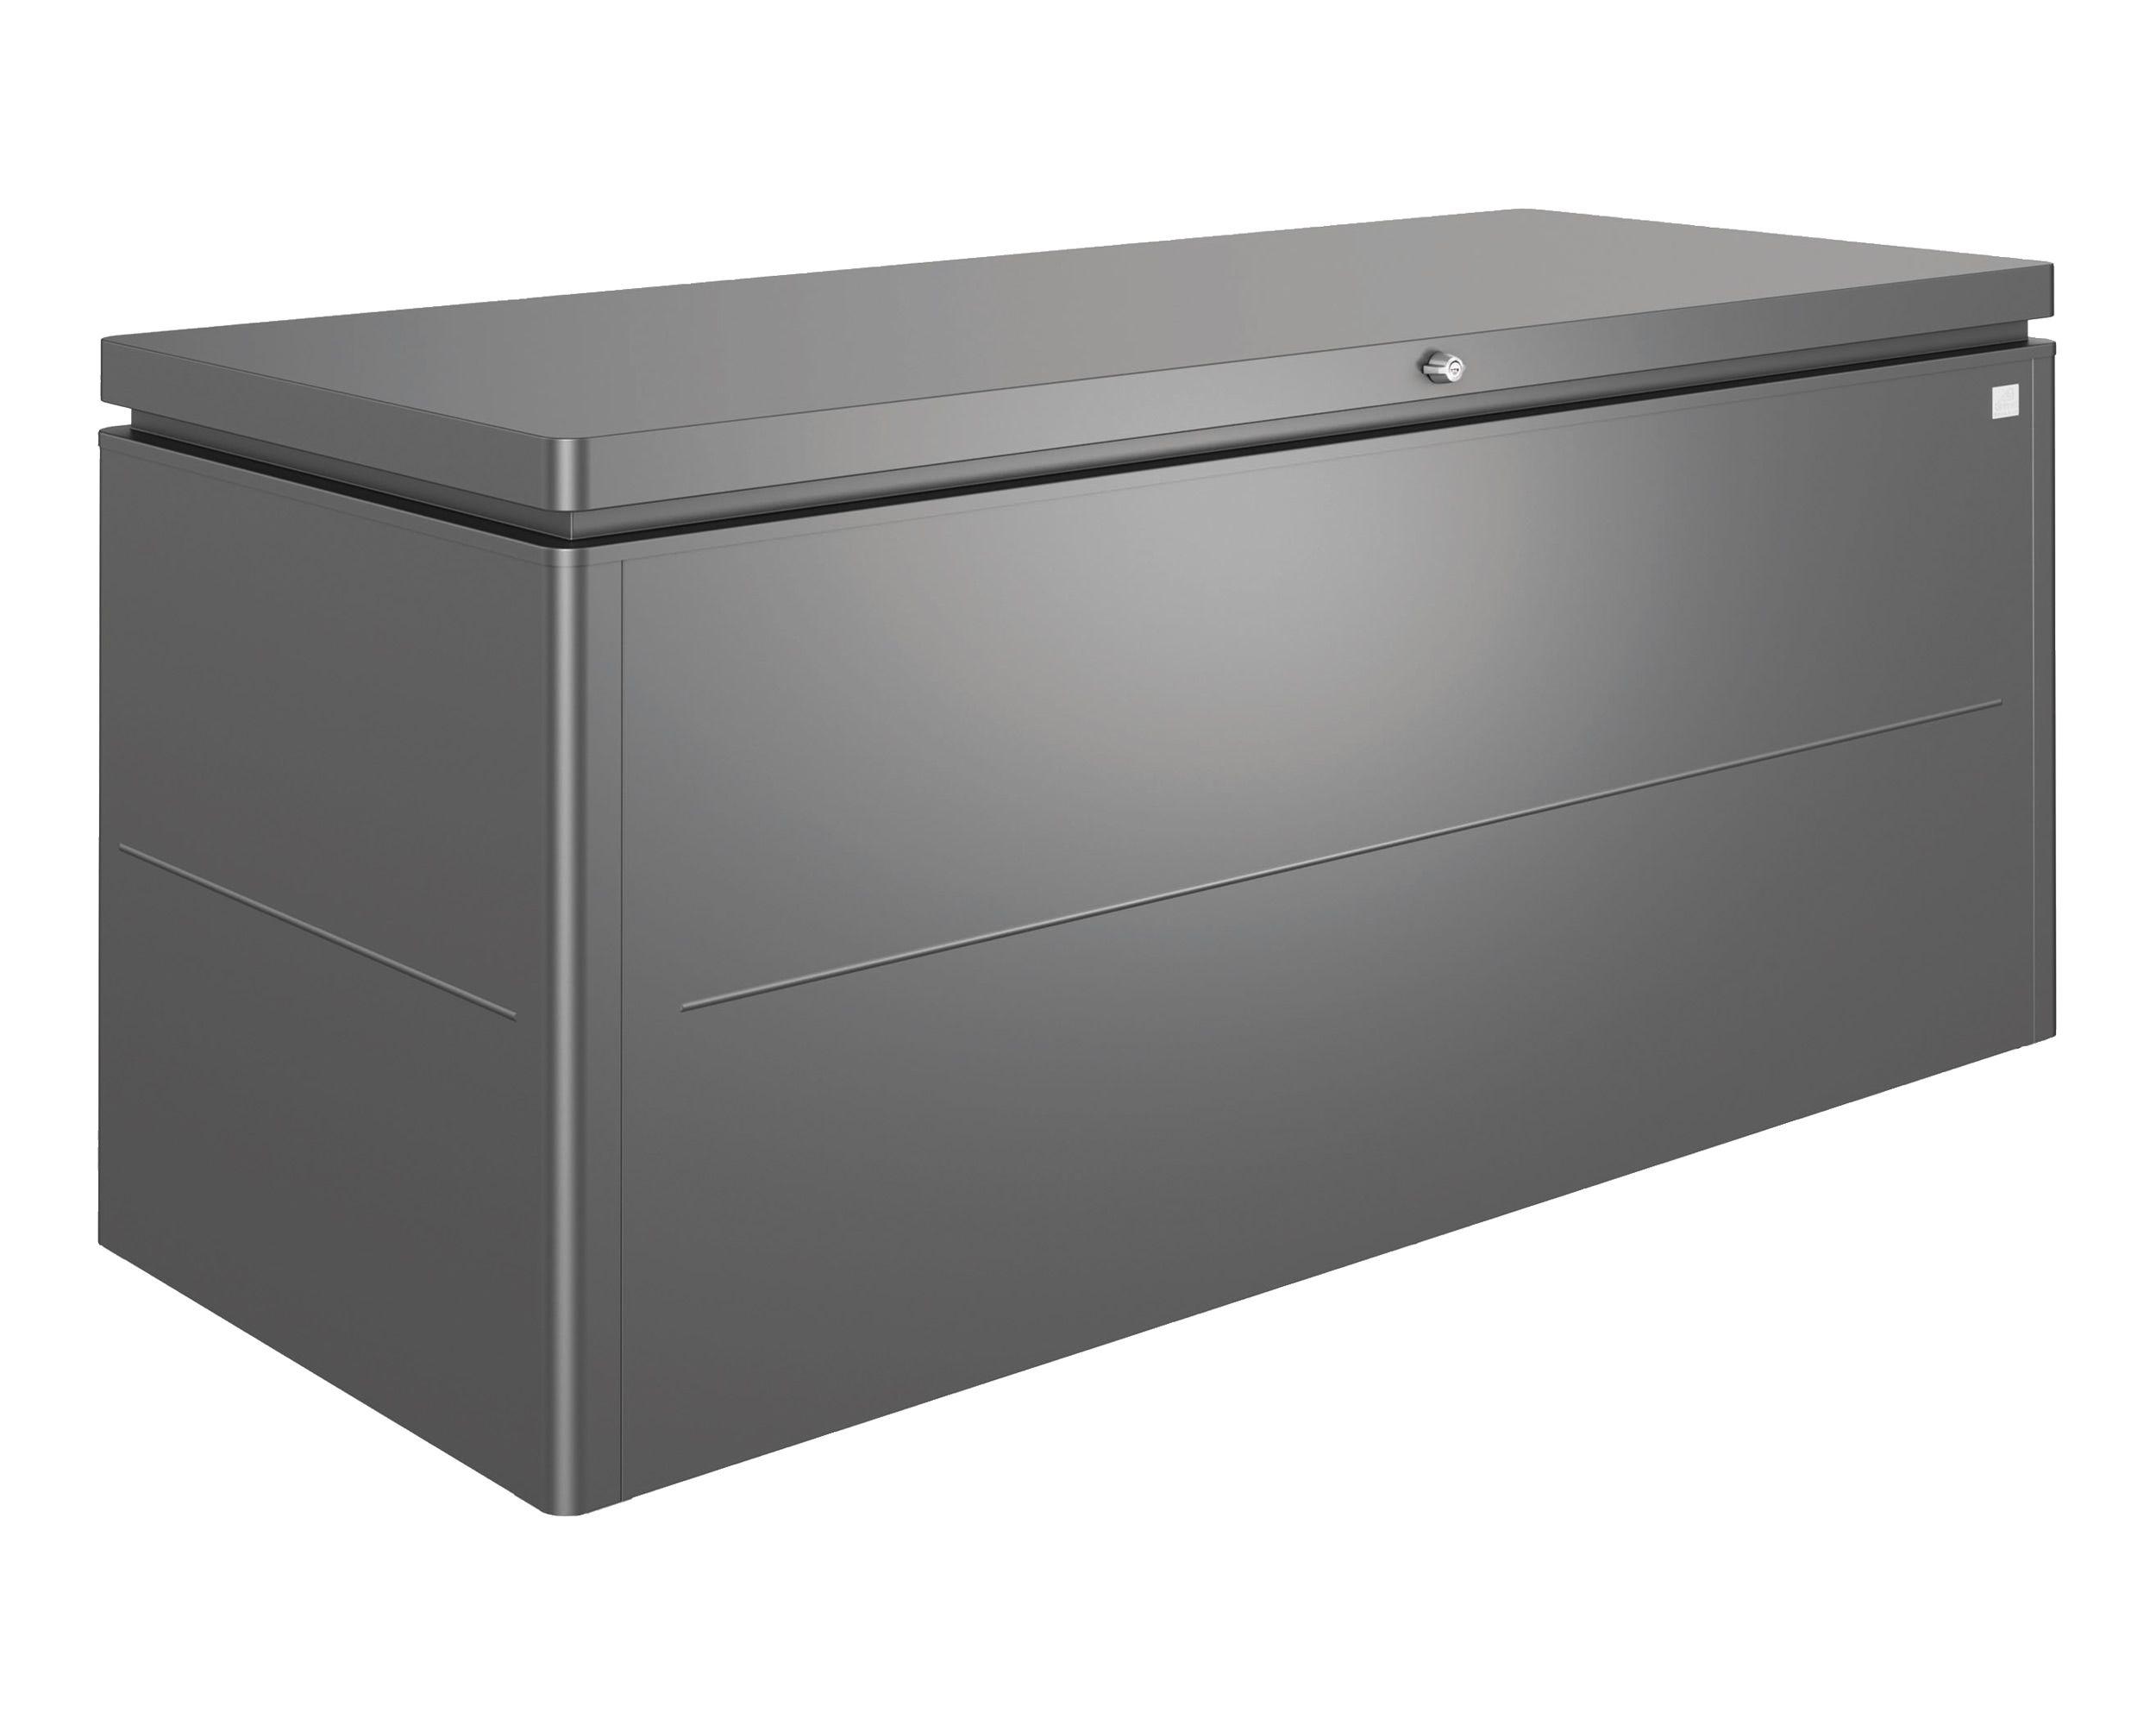 LoungeBox, 200x85 cm (H= 90)